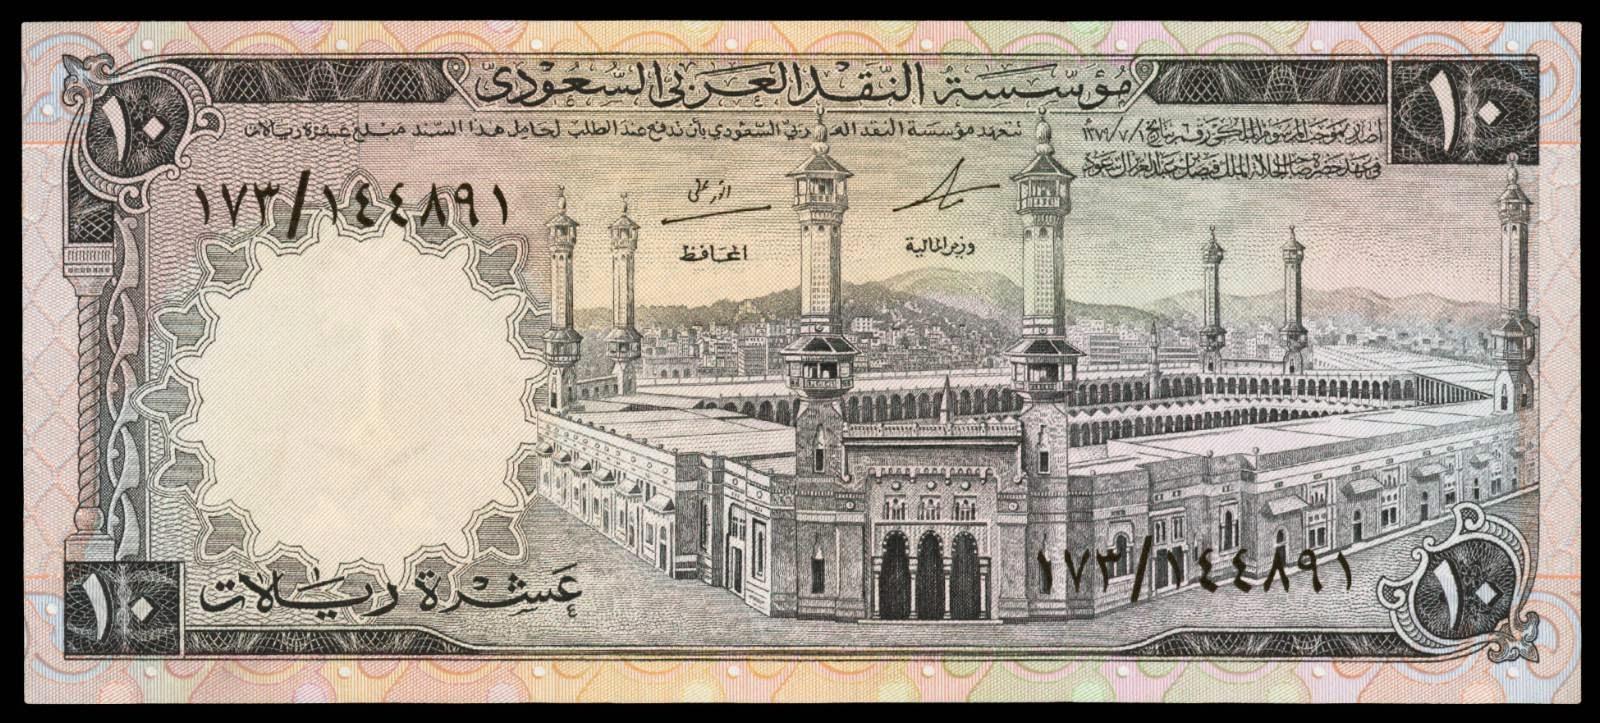 Forex arab saudi